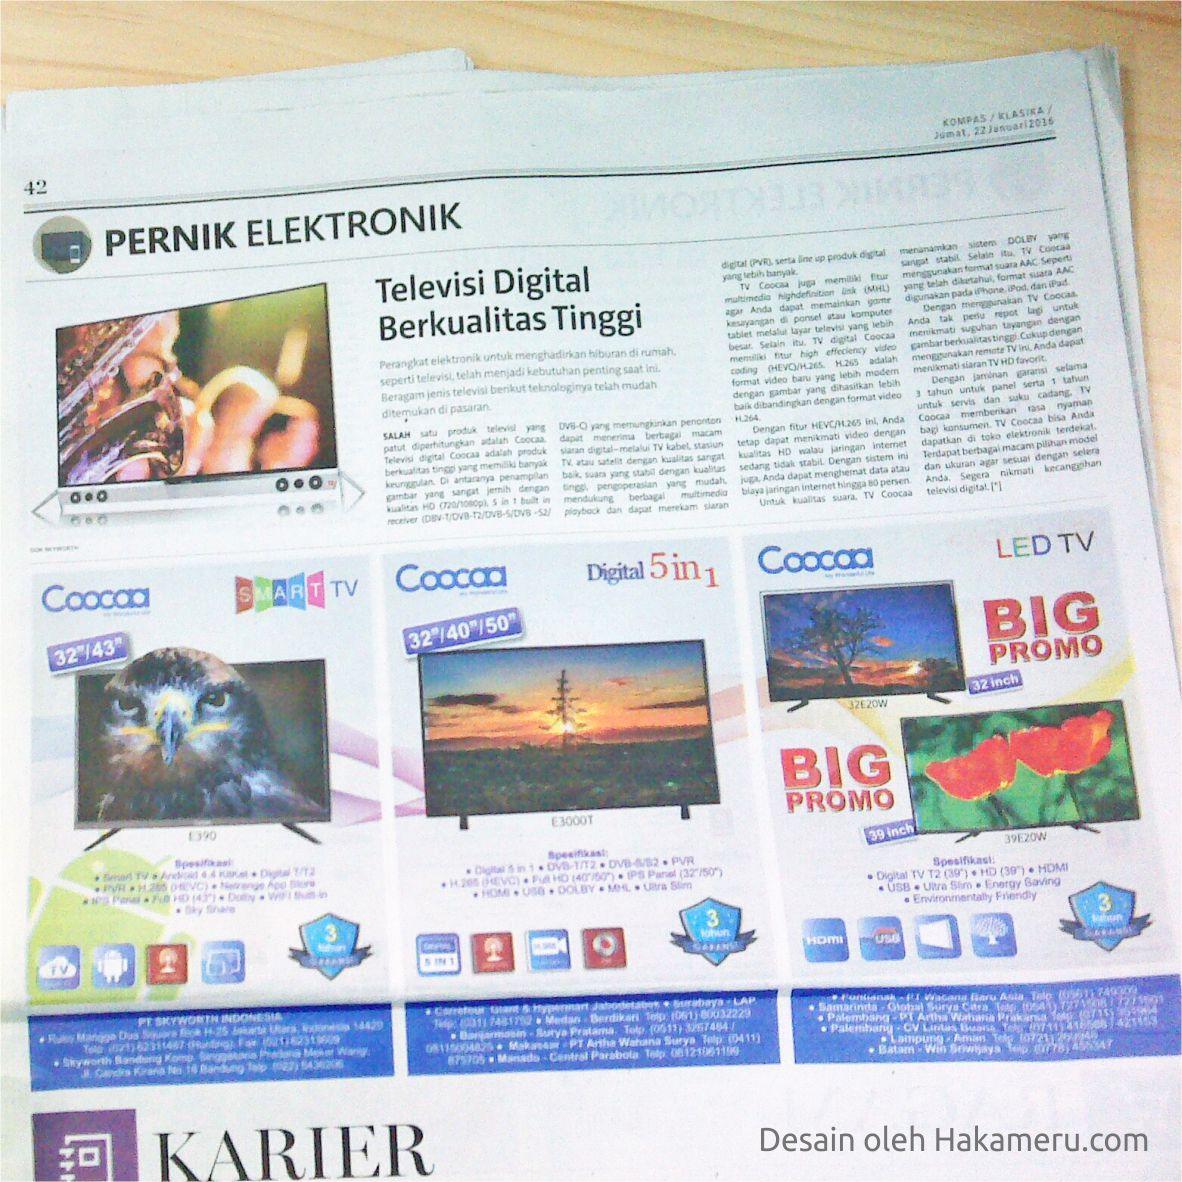 Desain iklan cetak print ad untuk perusahaan elektronik TV Skyworth - TV LED Coocaa - Jasa desain grafis online profesional HAKAMERU